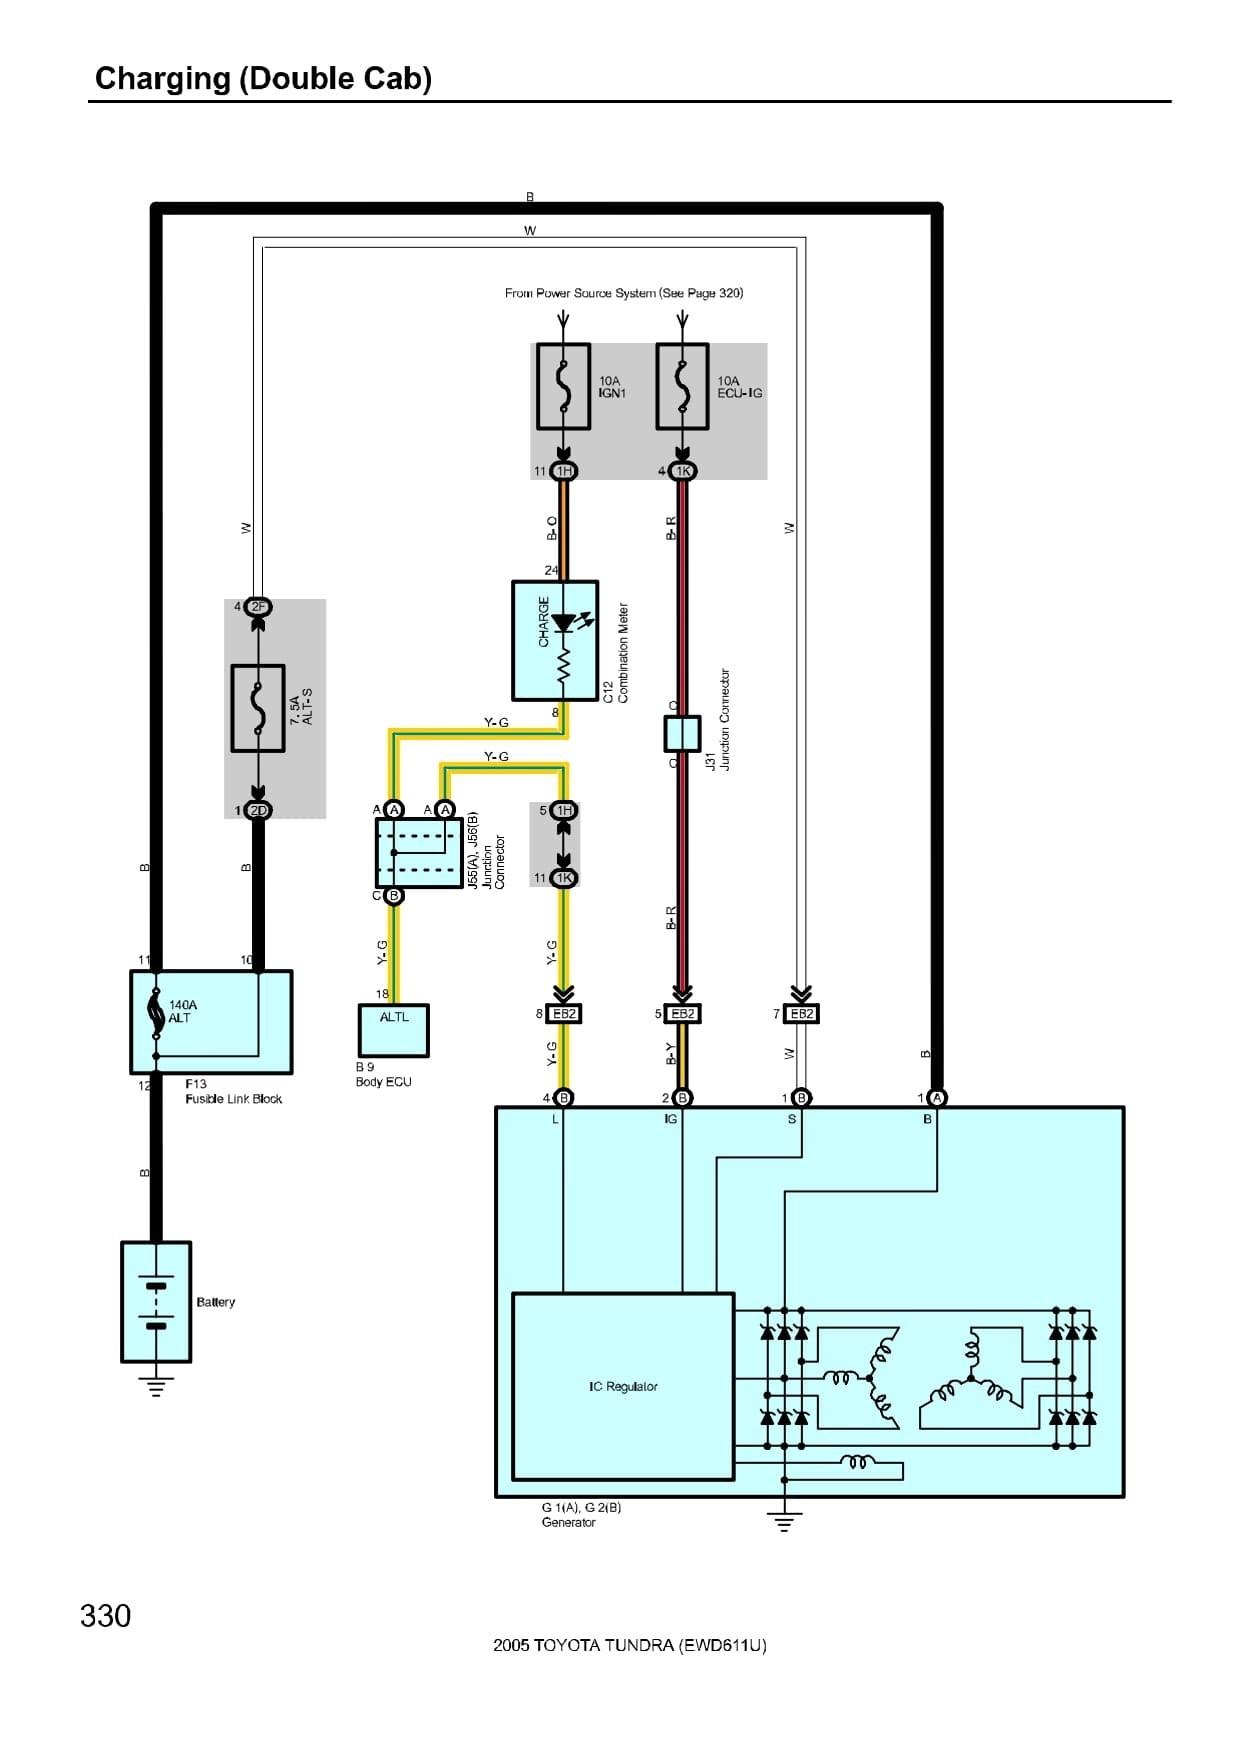 engine diagram 2111 tundra